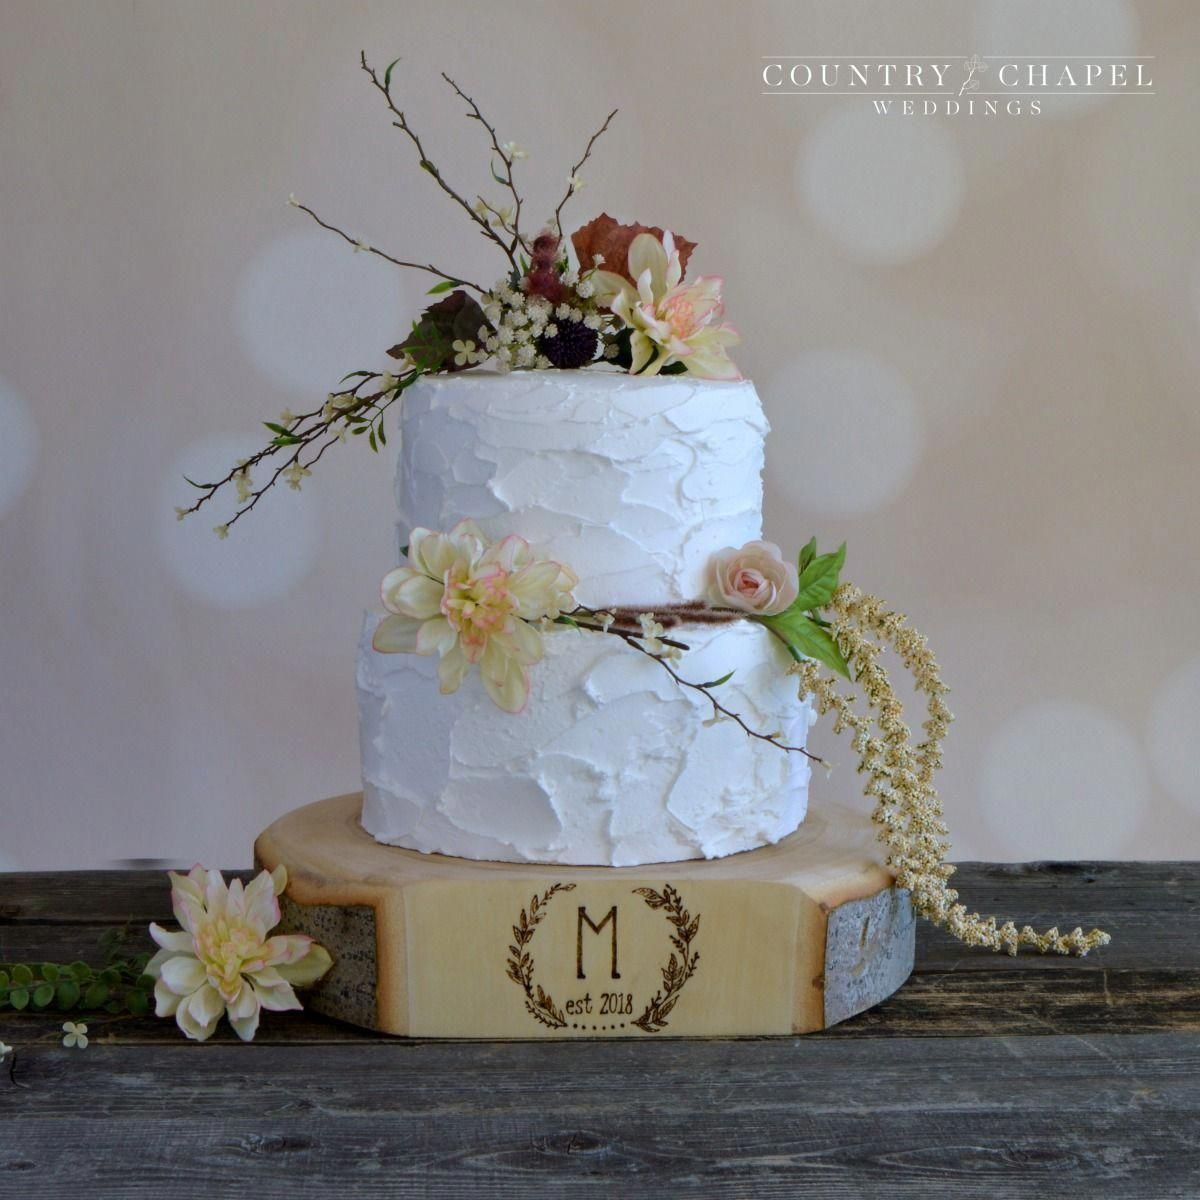 These monogram wreath wedding cake stands are sooooo pretty